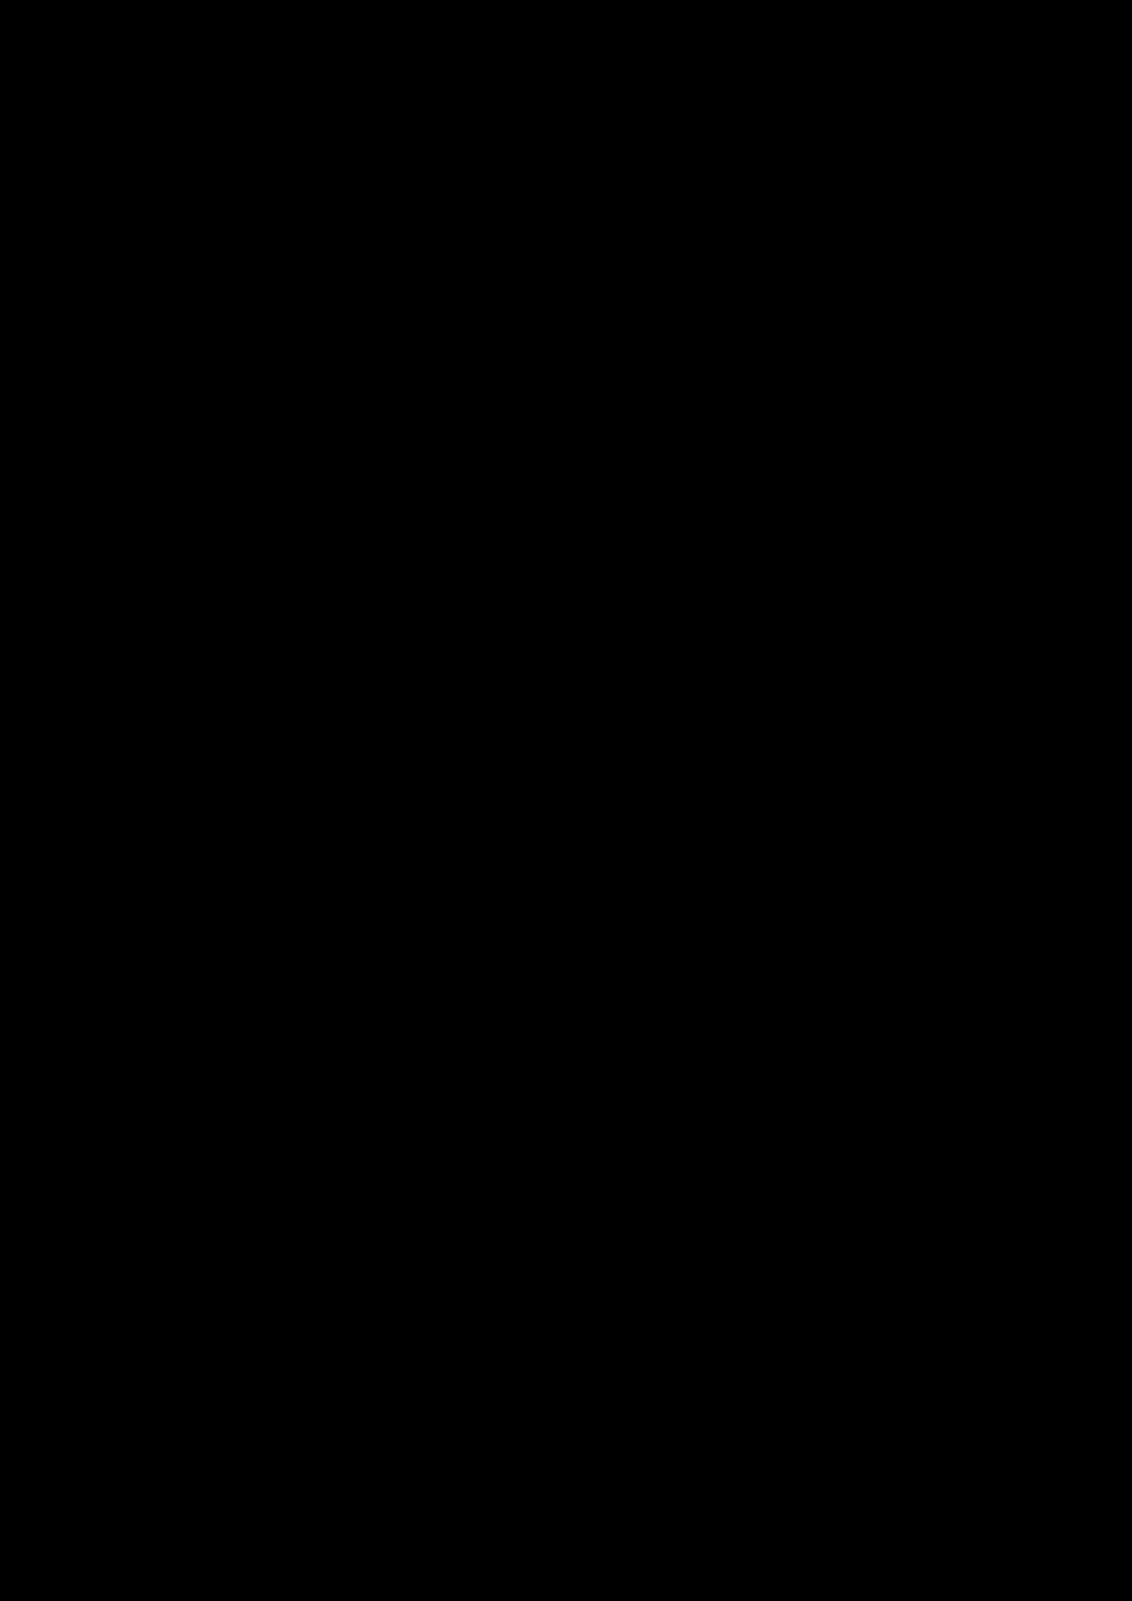 Korolevstvo slez slide, Image 7